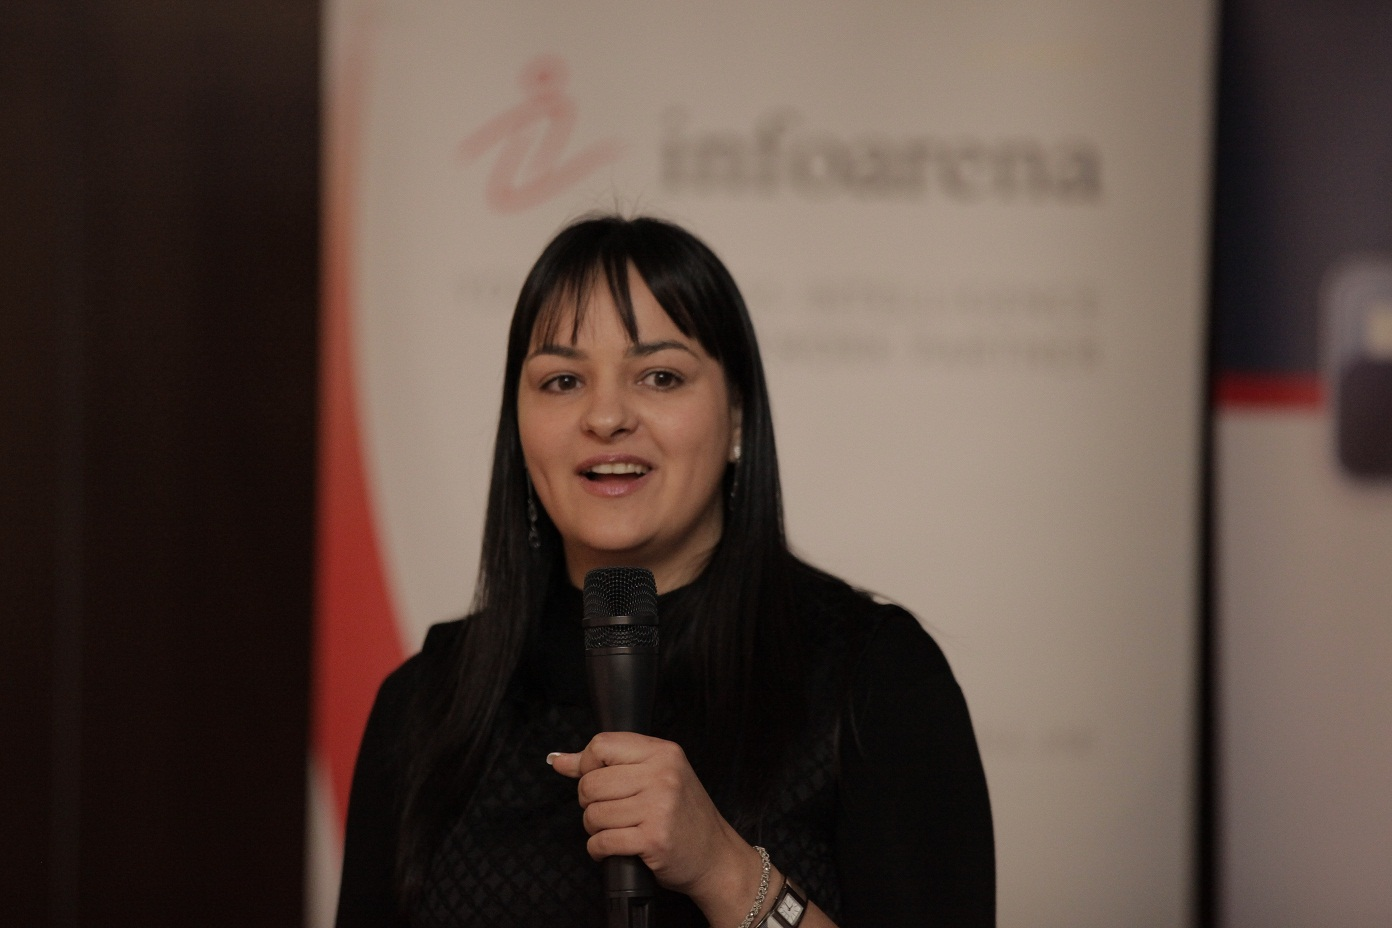 Irena Andric JTI